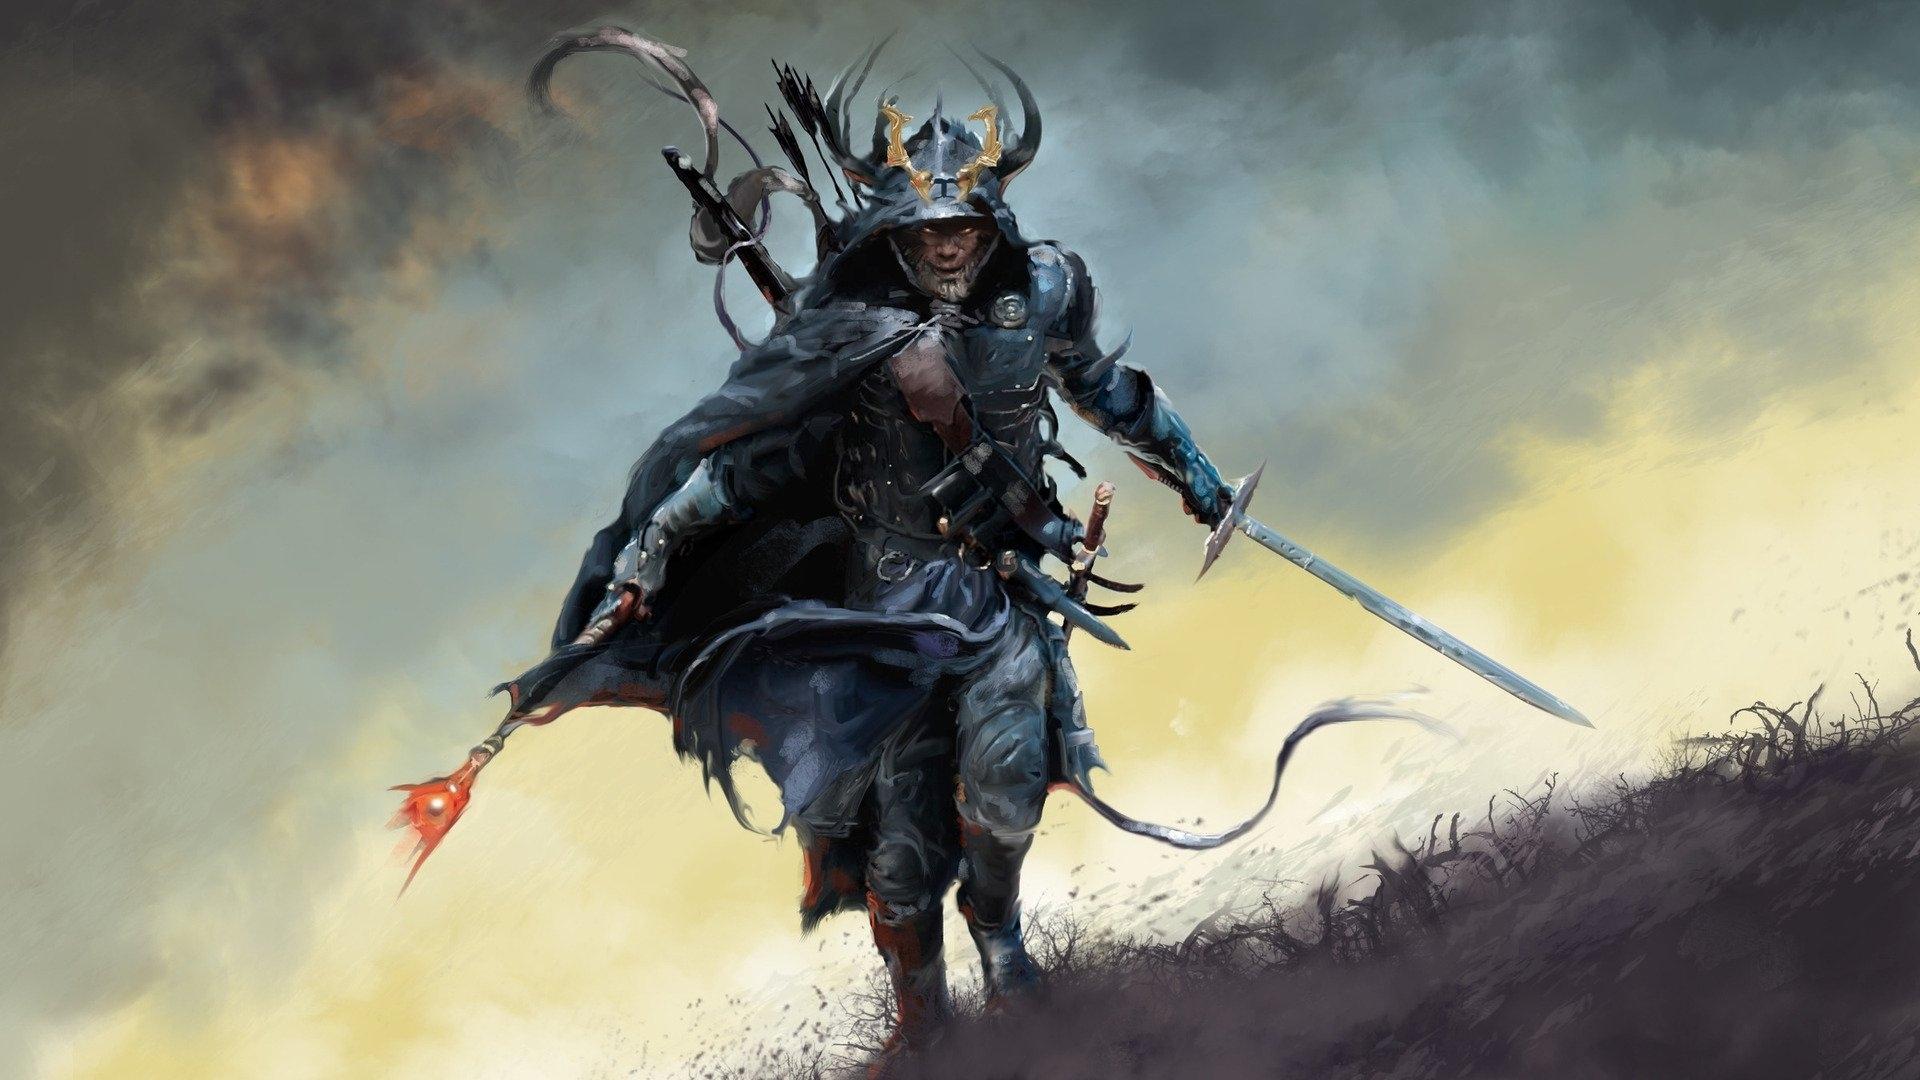 samurai full hd wallpaper and background image | 1920x1080 | id:545820